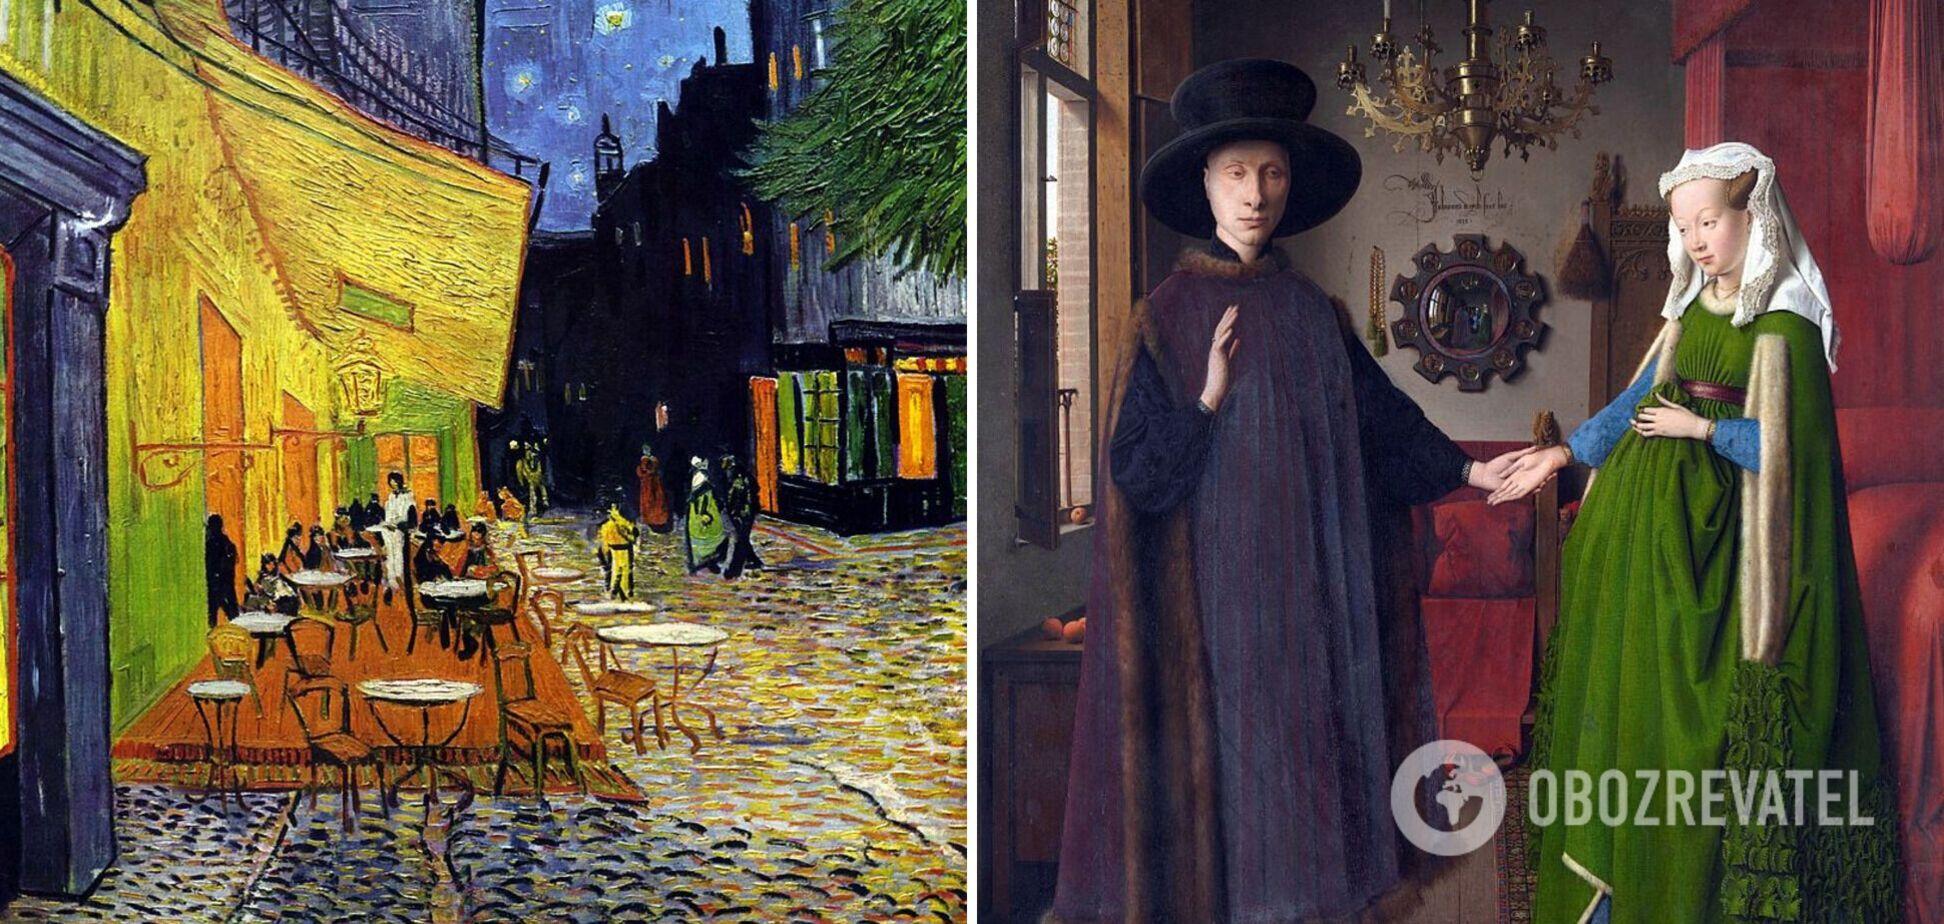 От Леонардо да Винчи до Клода Моне: 7 самых загадочных картин в истории. Фото